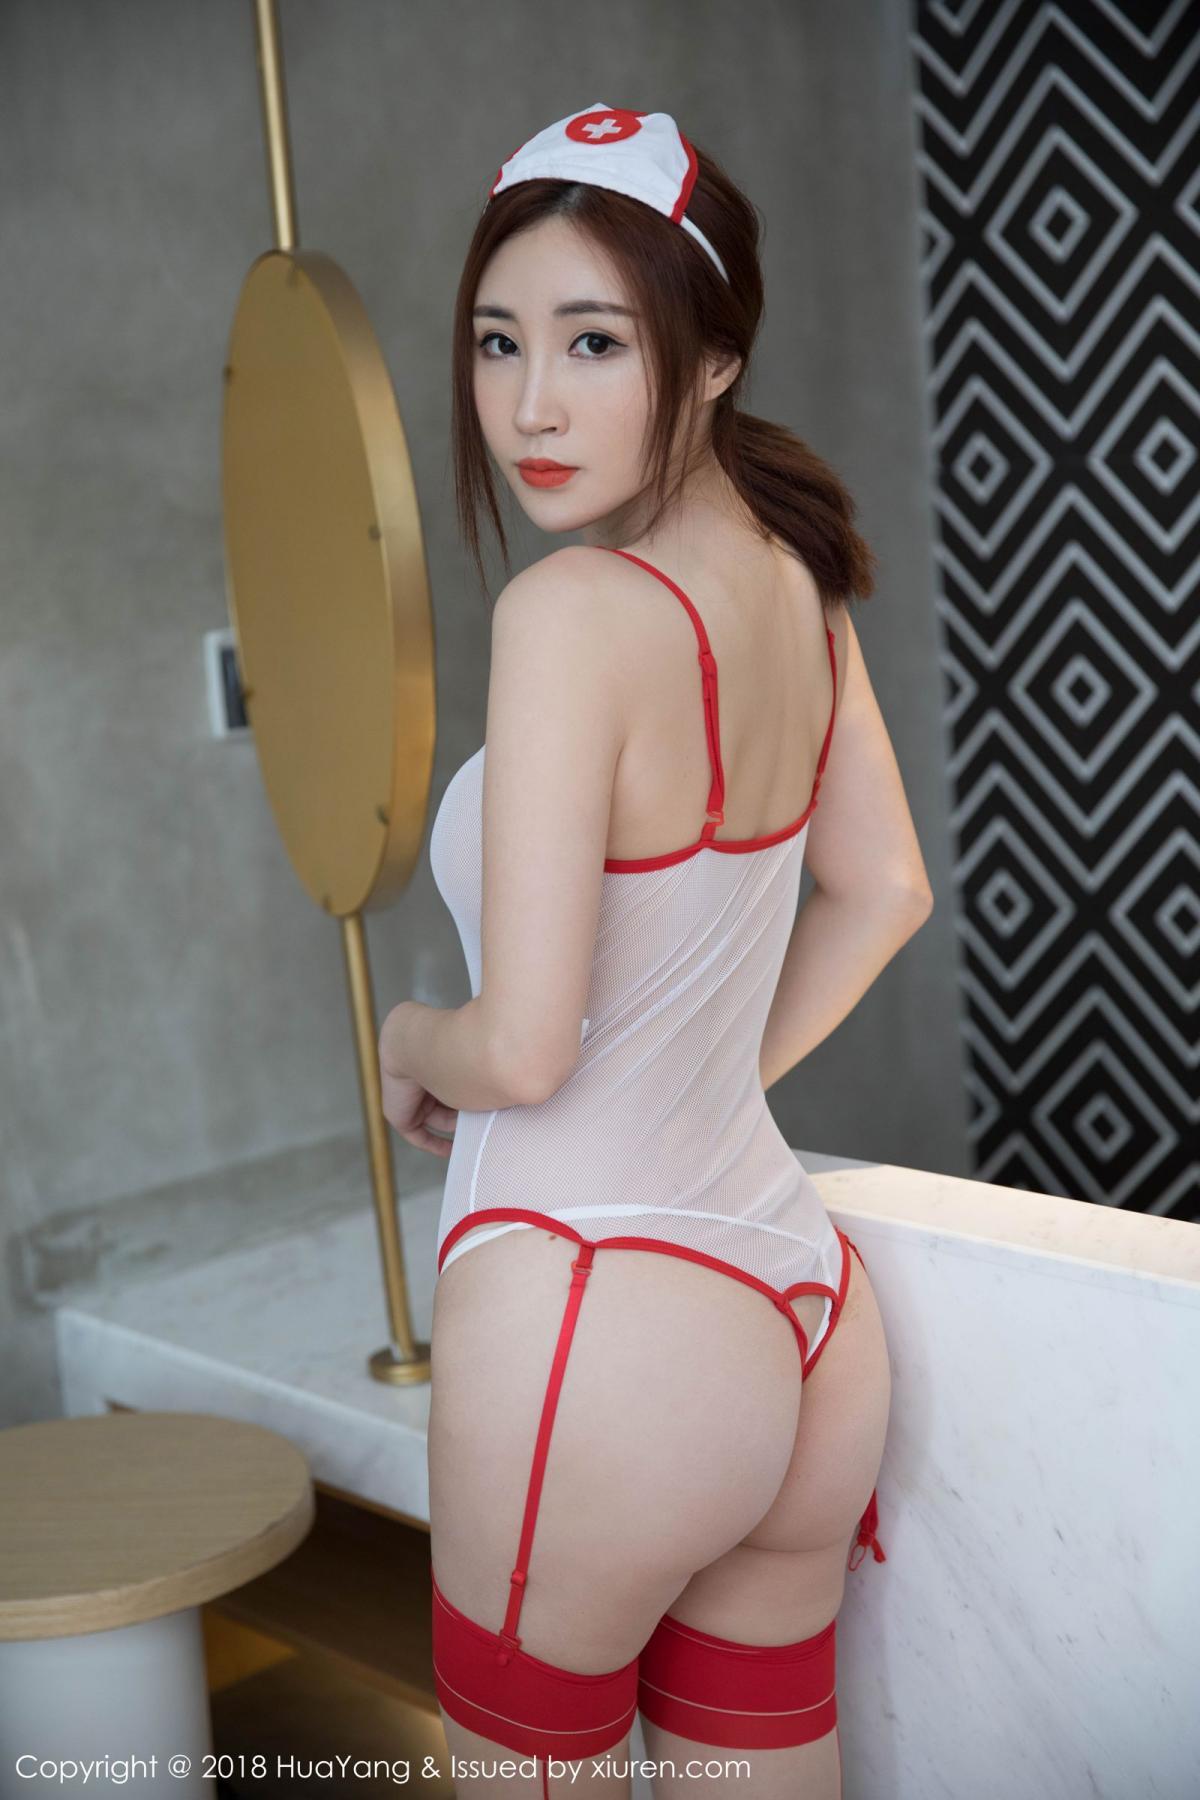 [Huayang] Vol.092 Sun Meng Yao 12P, HuaYang, Nurse, Sun Meng Yao, Tall, Uniform